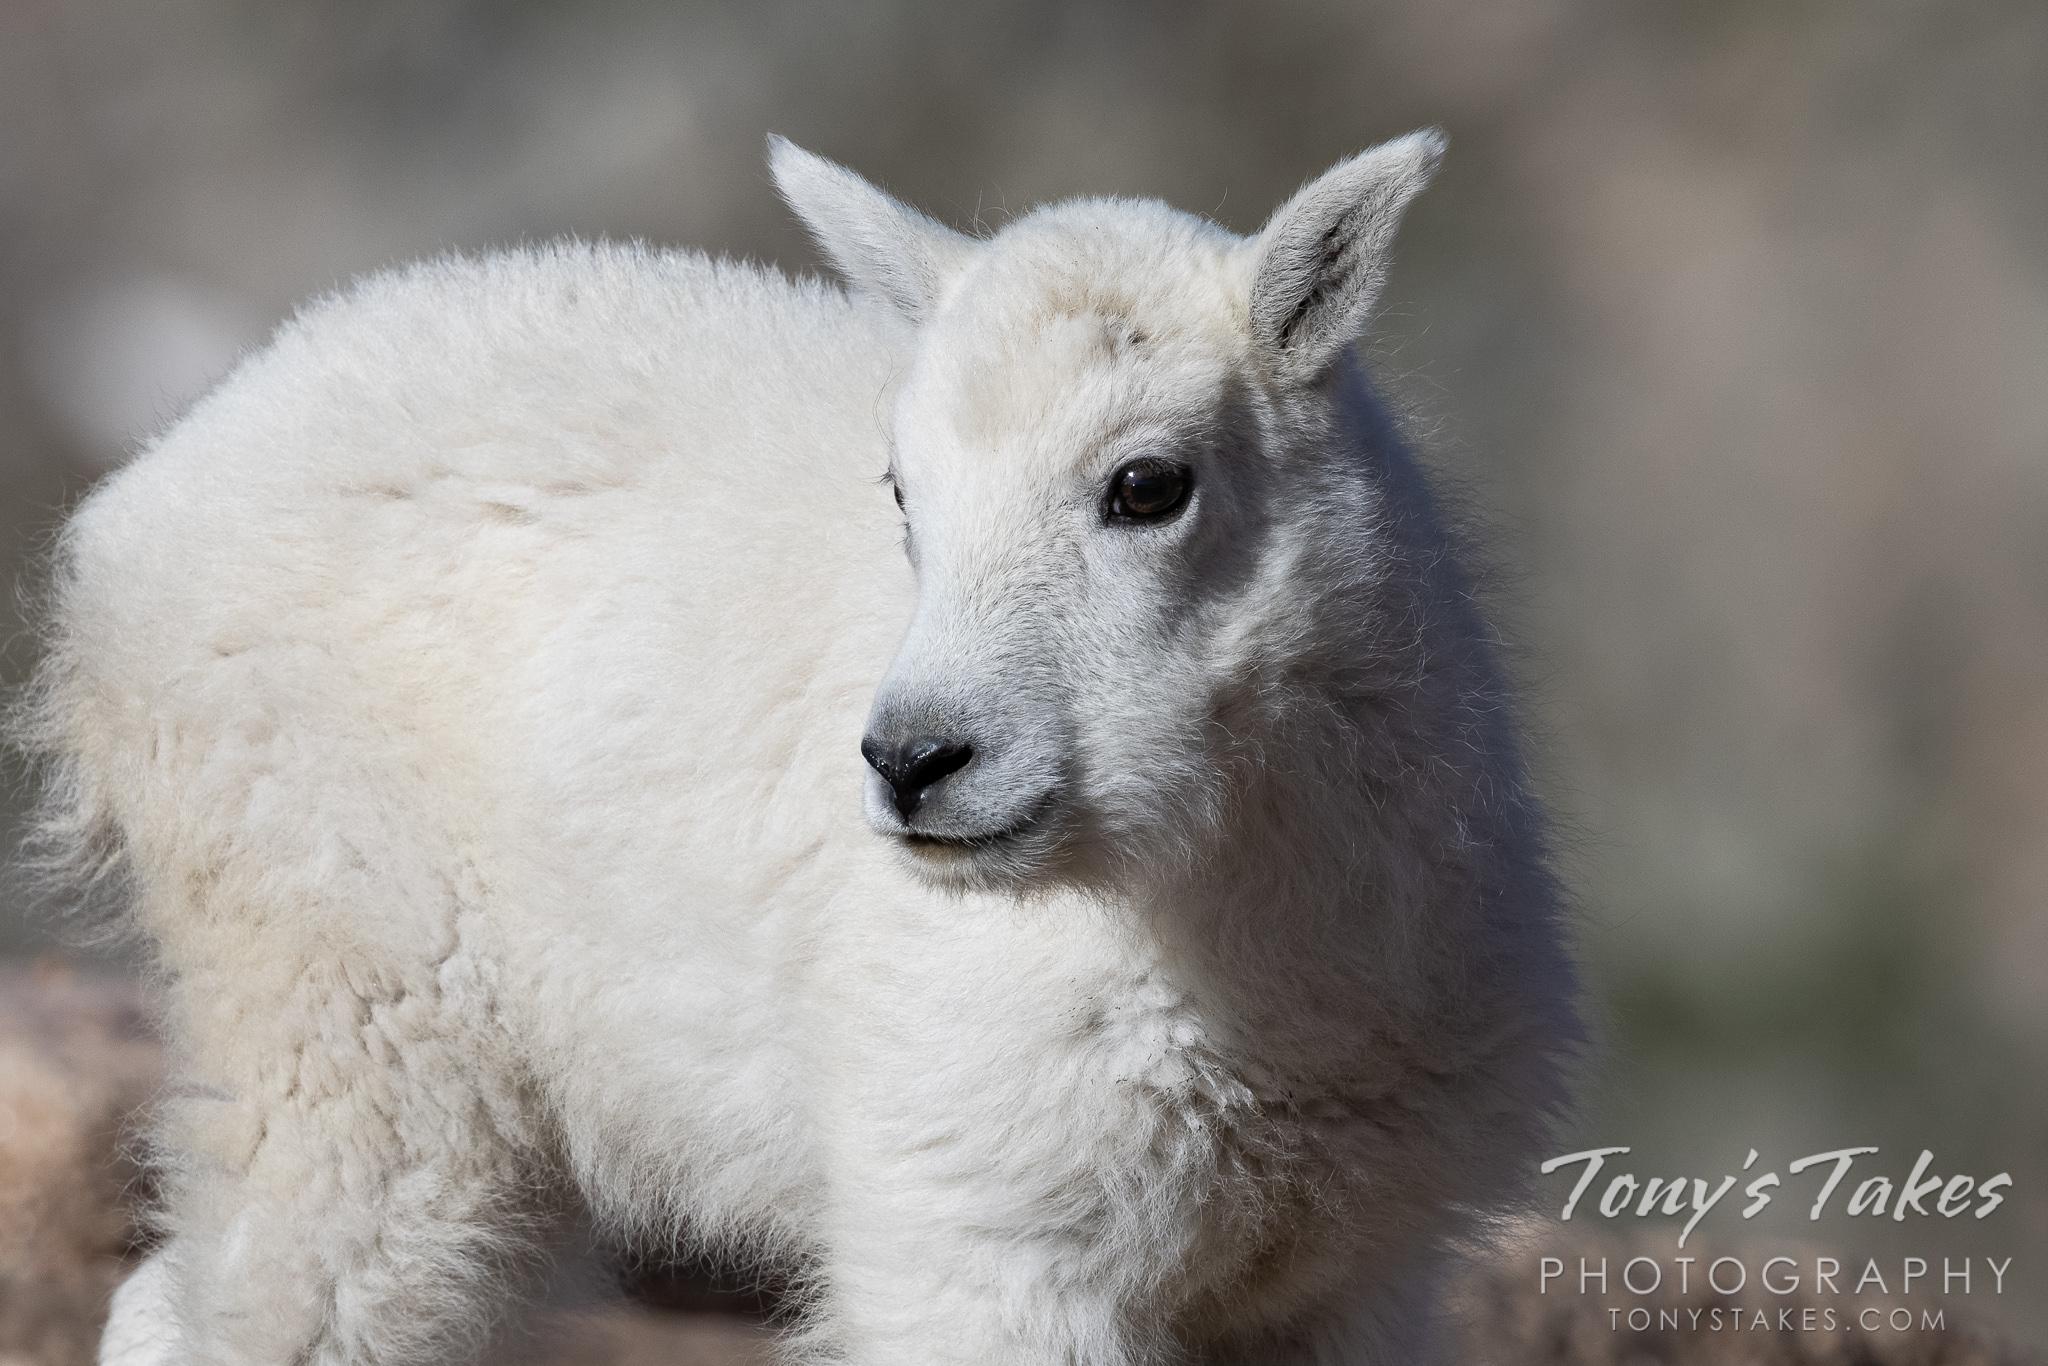 Portrait of a mountain goat kid